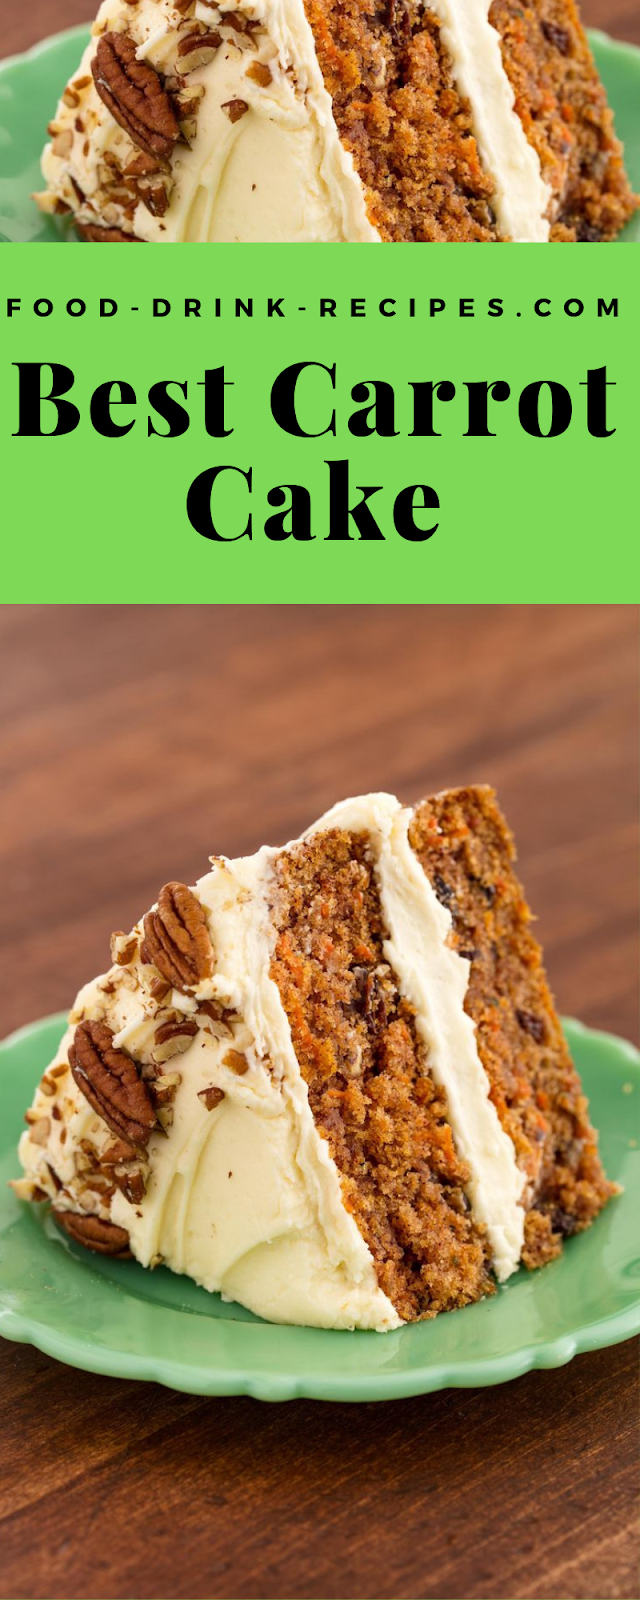 Best Carrot Cake - food-drink-recipes.com